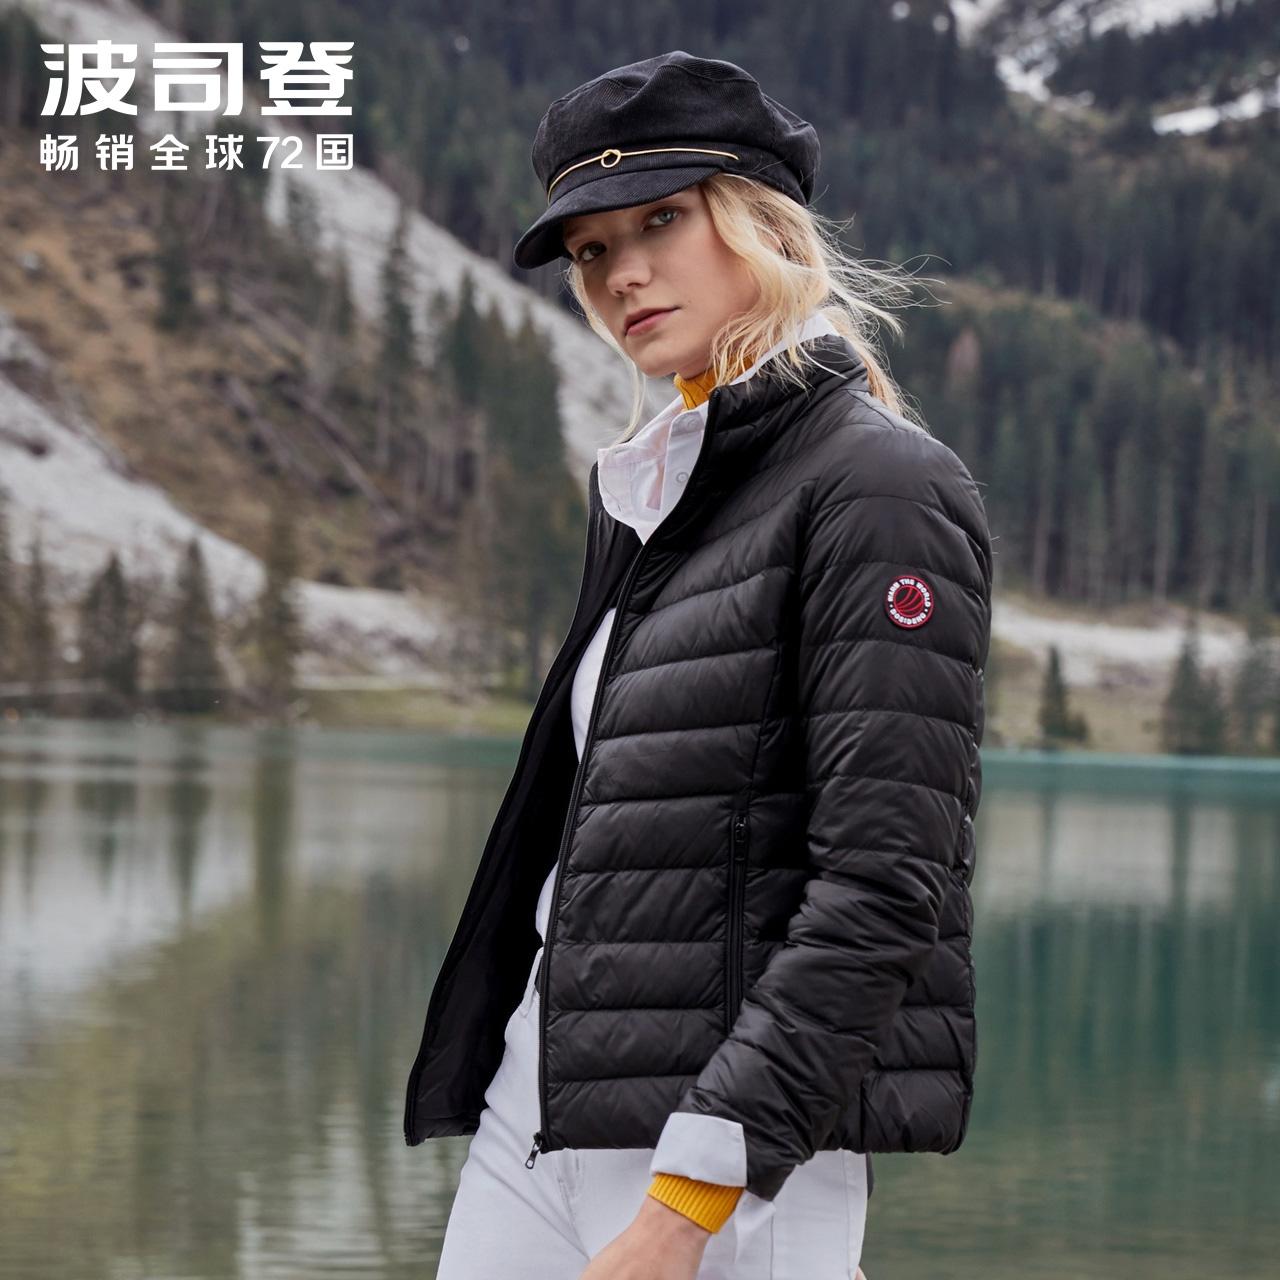 B90131010 2019  波司登 新款轻薄羽绒服女短款时尚韩版修身潮女装